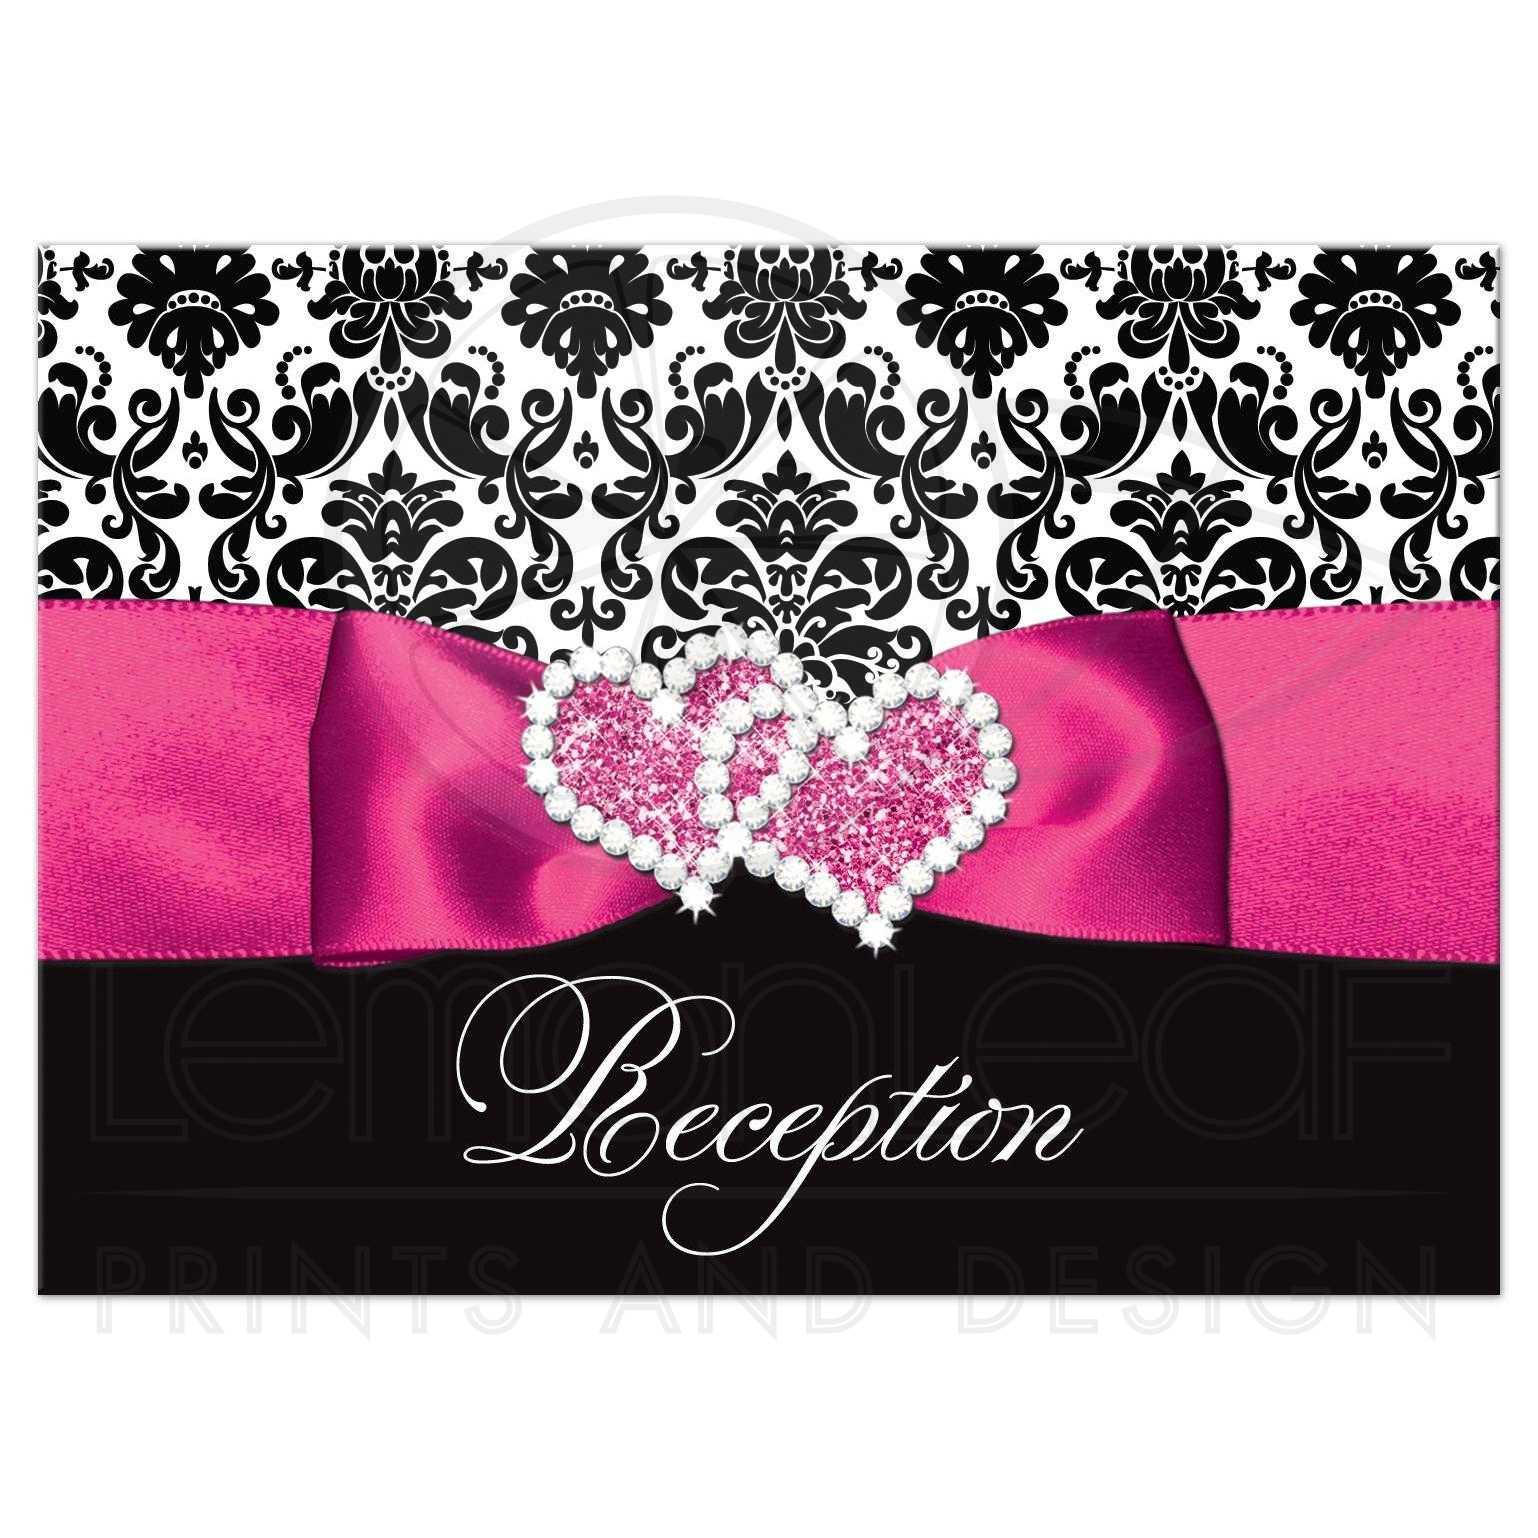 Wedding Reception Enclosure Card | Black and White Damask | PRINTED ...